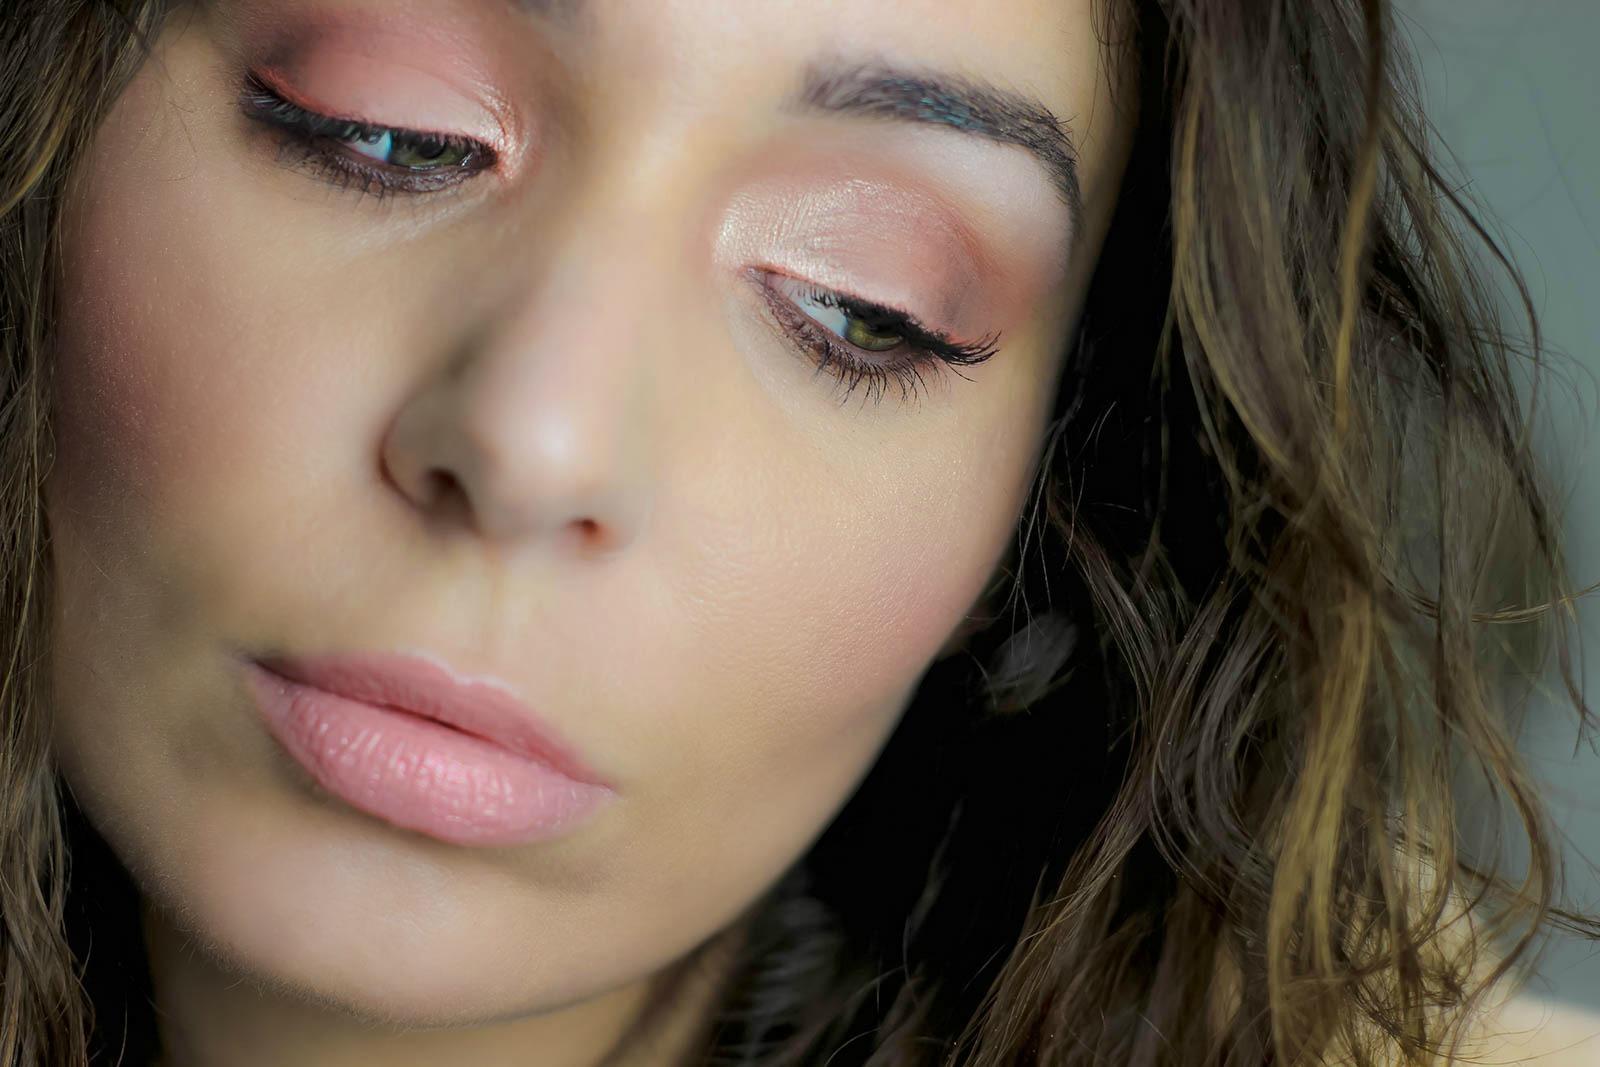 SWEET_PEACH_TOOFACED_makeup-2-2